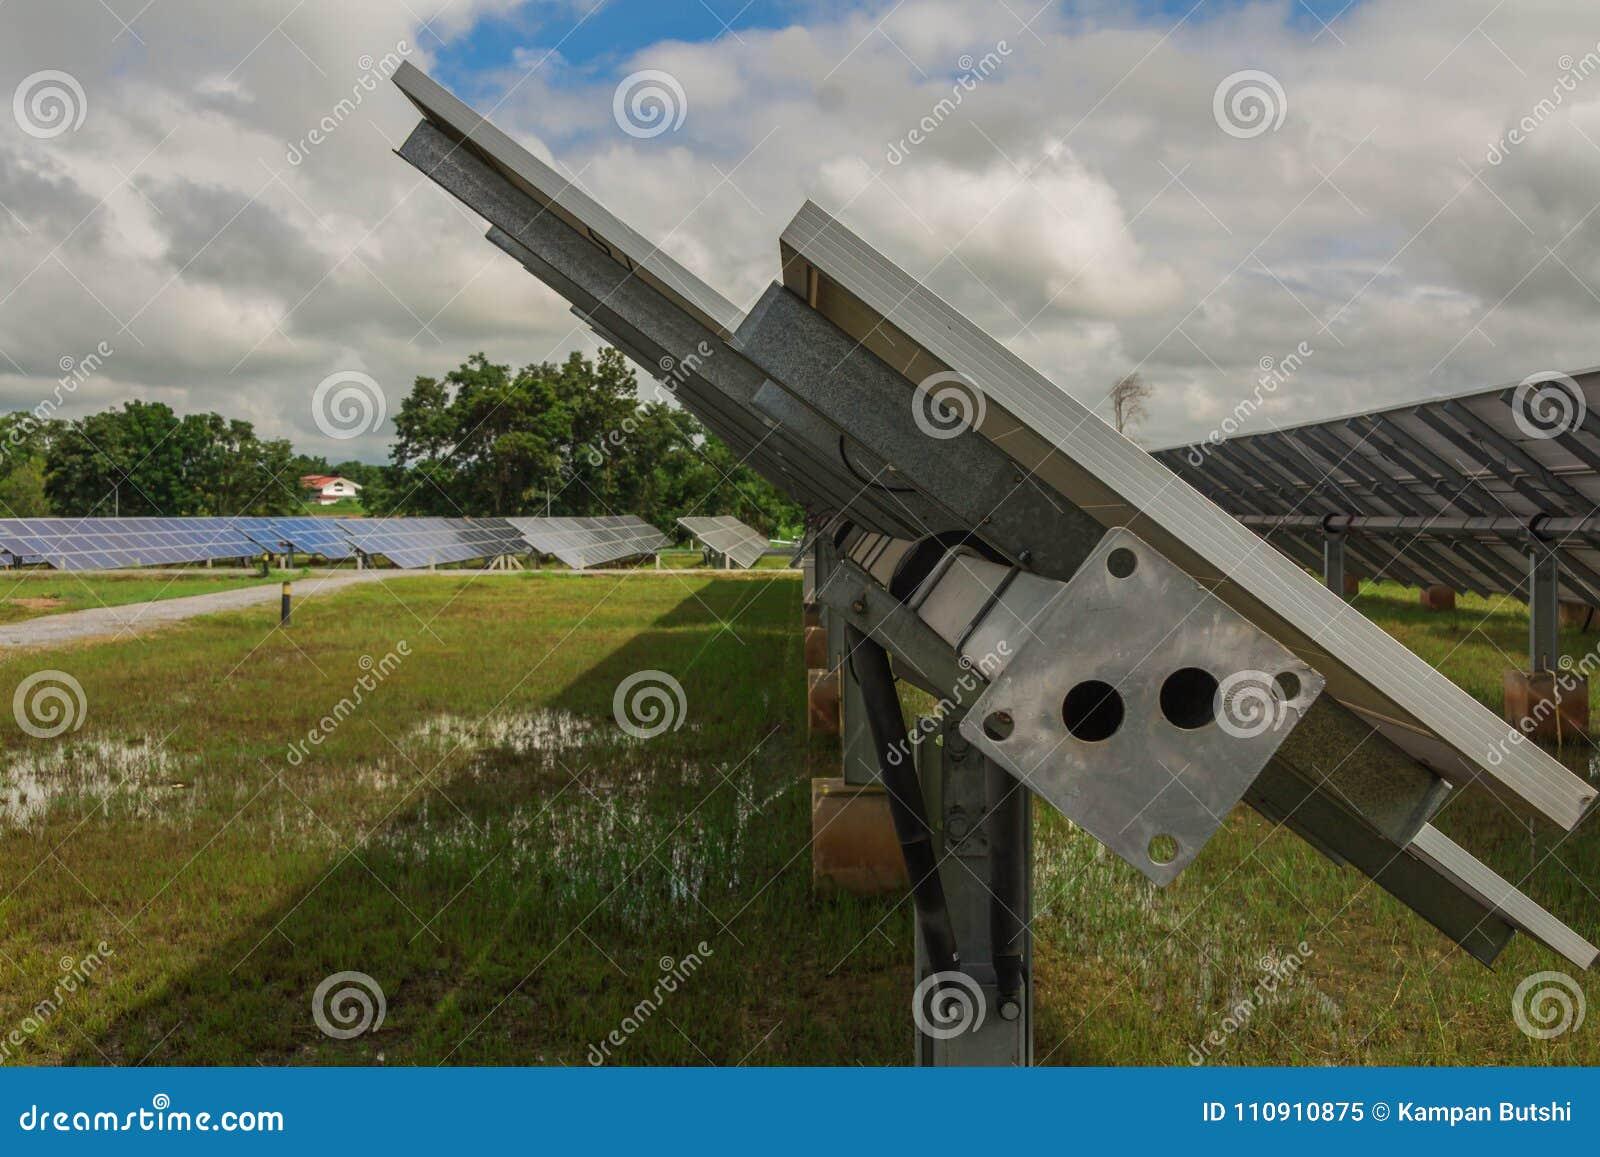 Подсказка трубки вращающего момента, 4 5MM/6MM в системе слежения завода солнечной